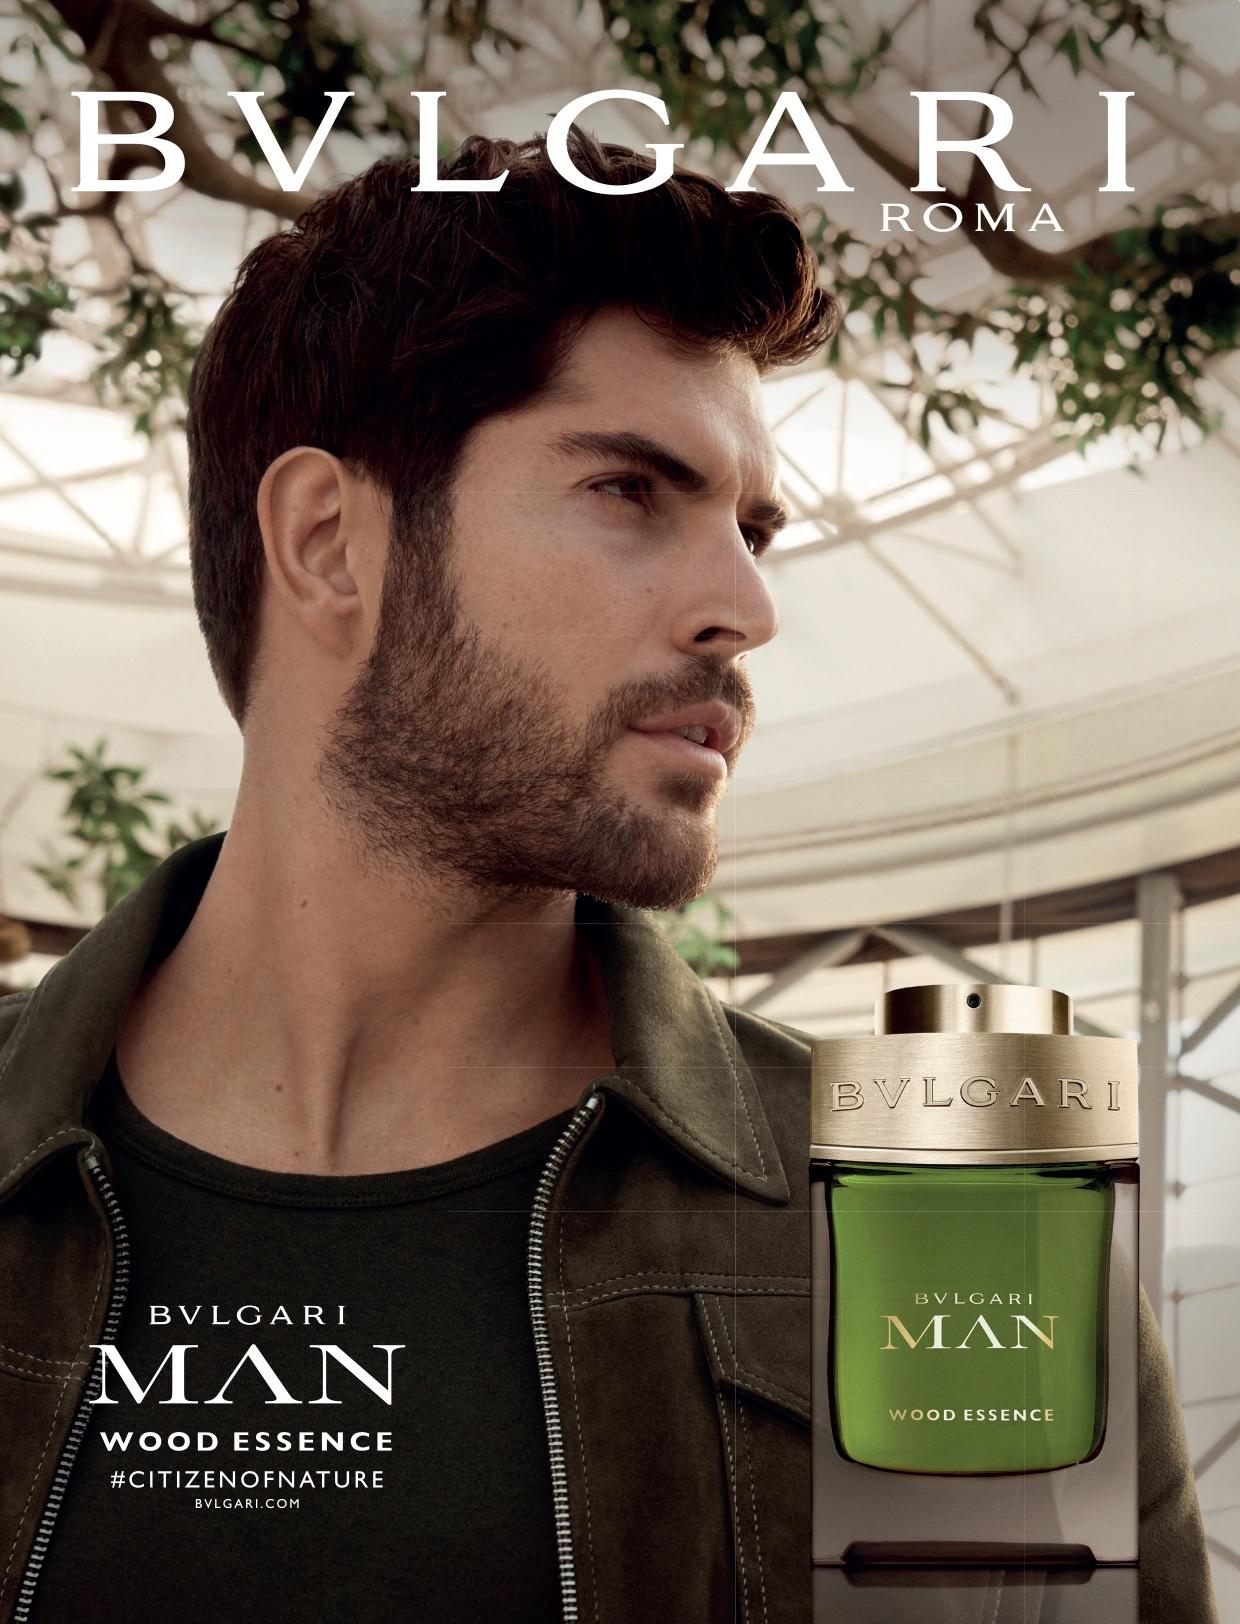 Bvlgari Man Wood Essence ~ New Fragrances 9def567e7e